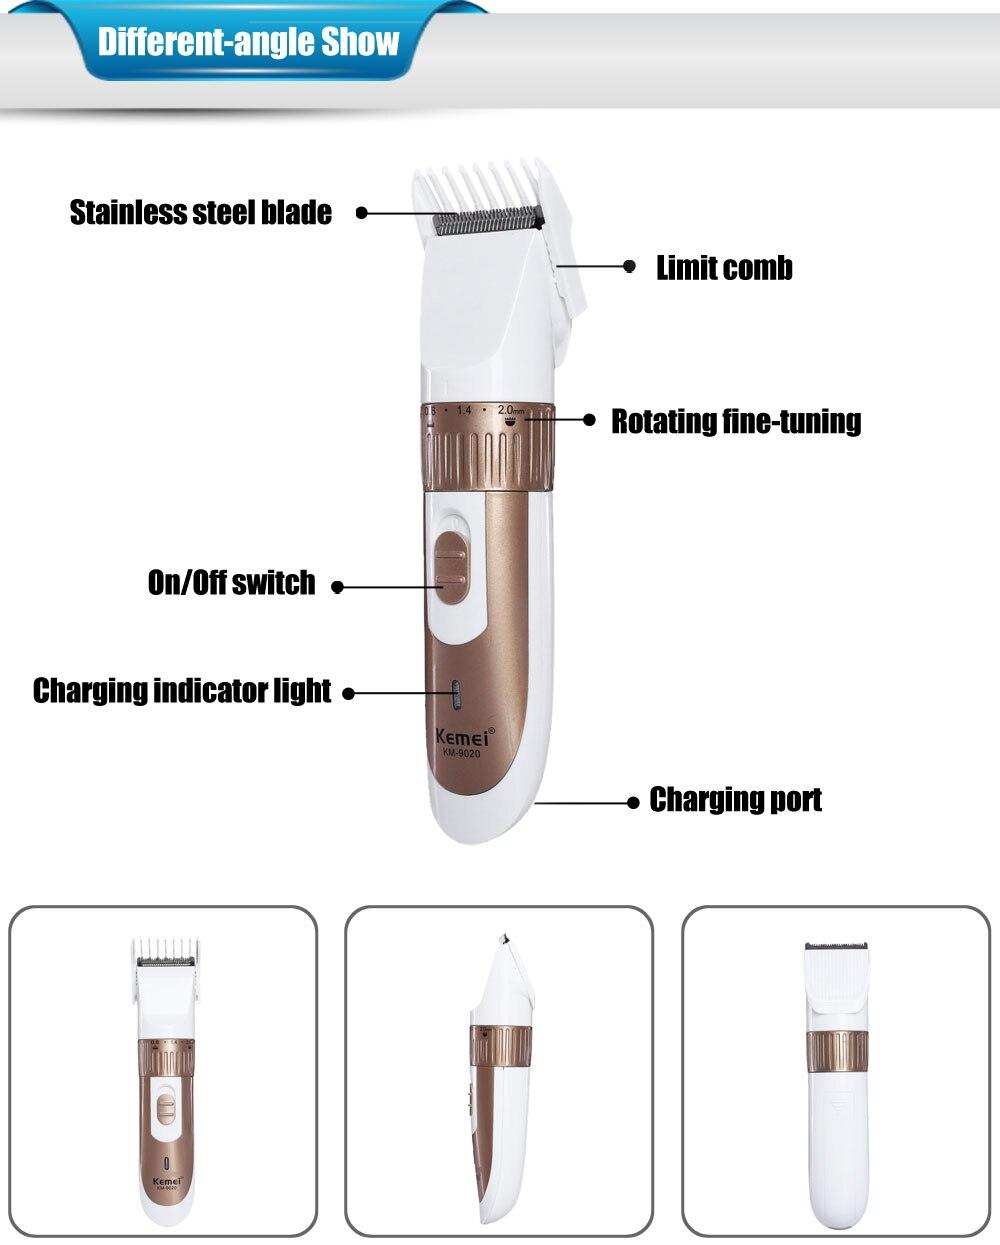 Kemei ajustable lmite peine styling kit recargable pelo trimmer 815087a41b6a